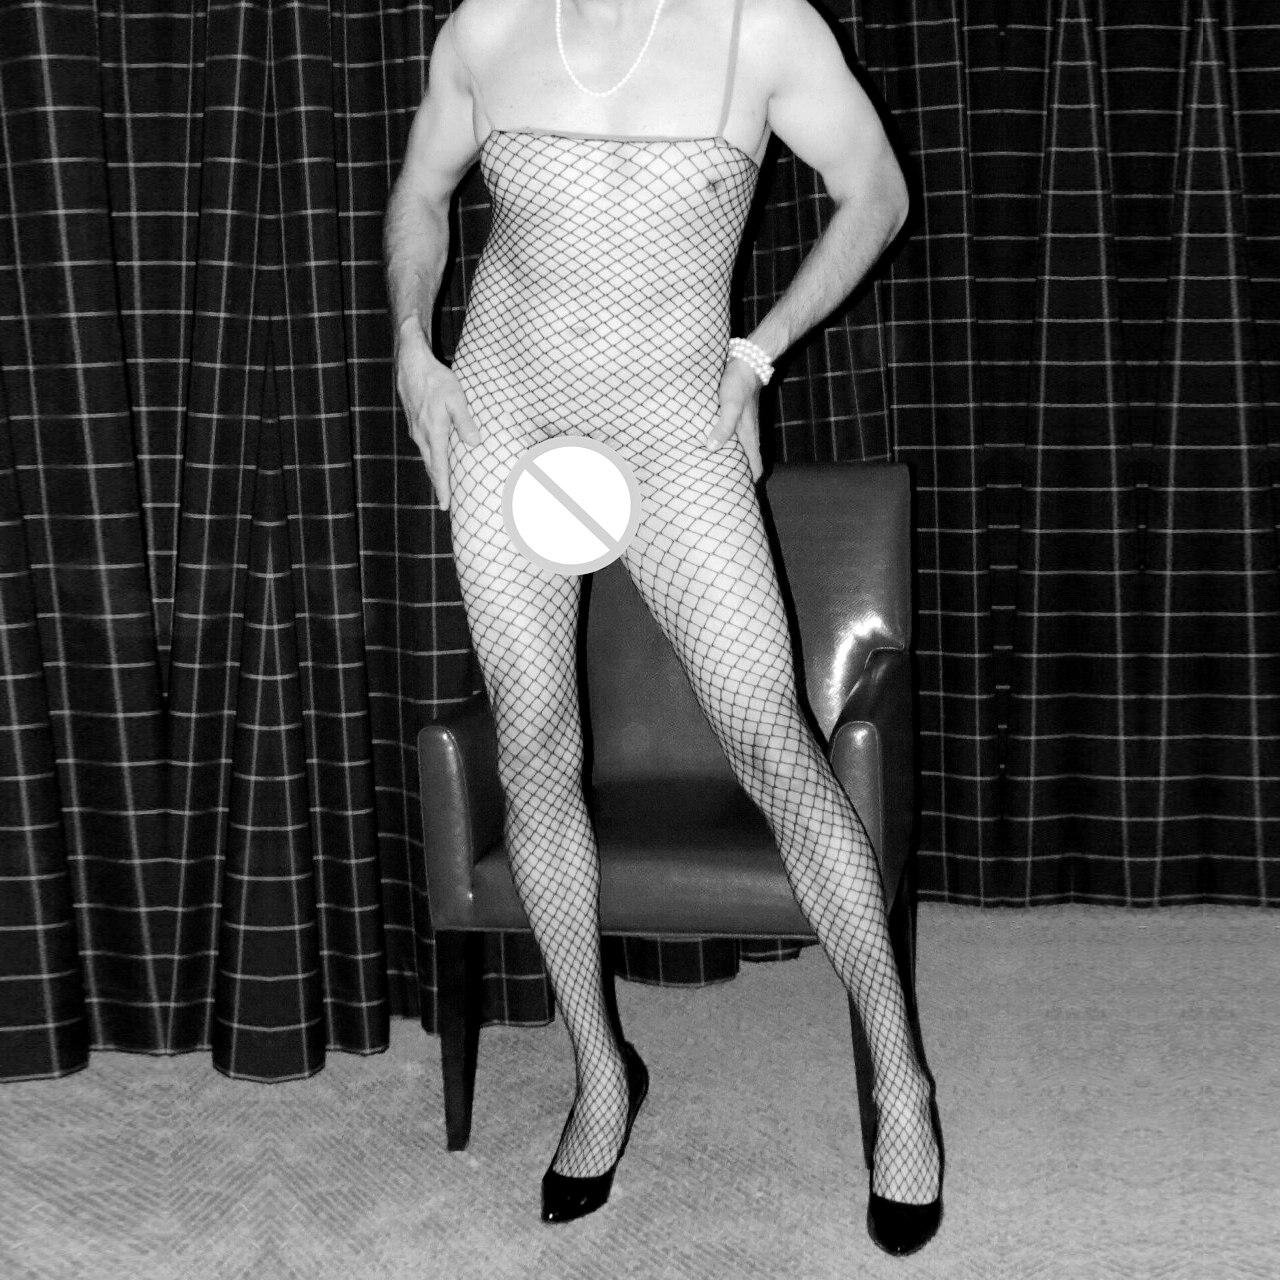 2017 Sexy Men Stockings Tight Fashion Men Pantyhose Gay